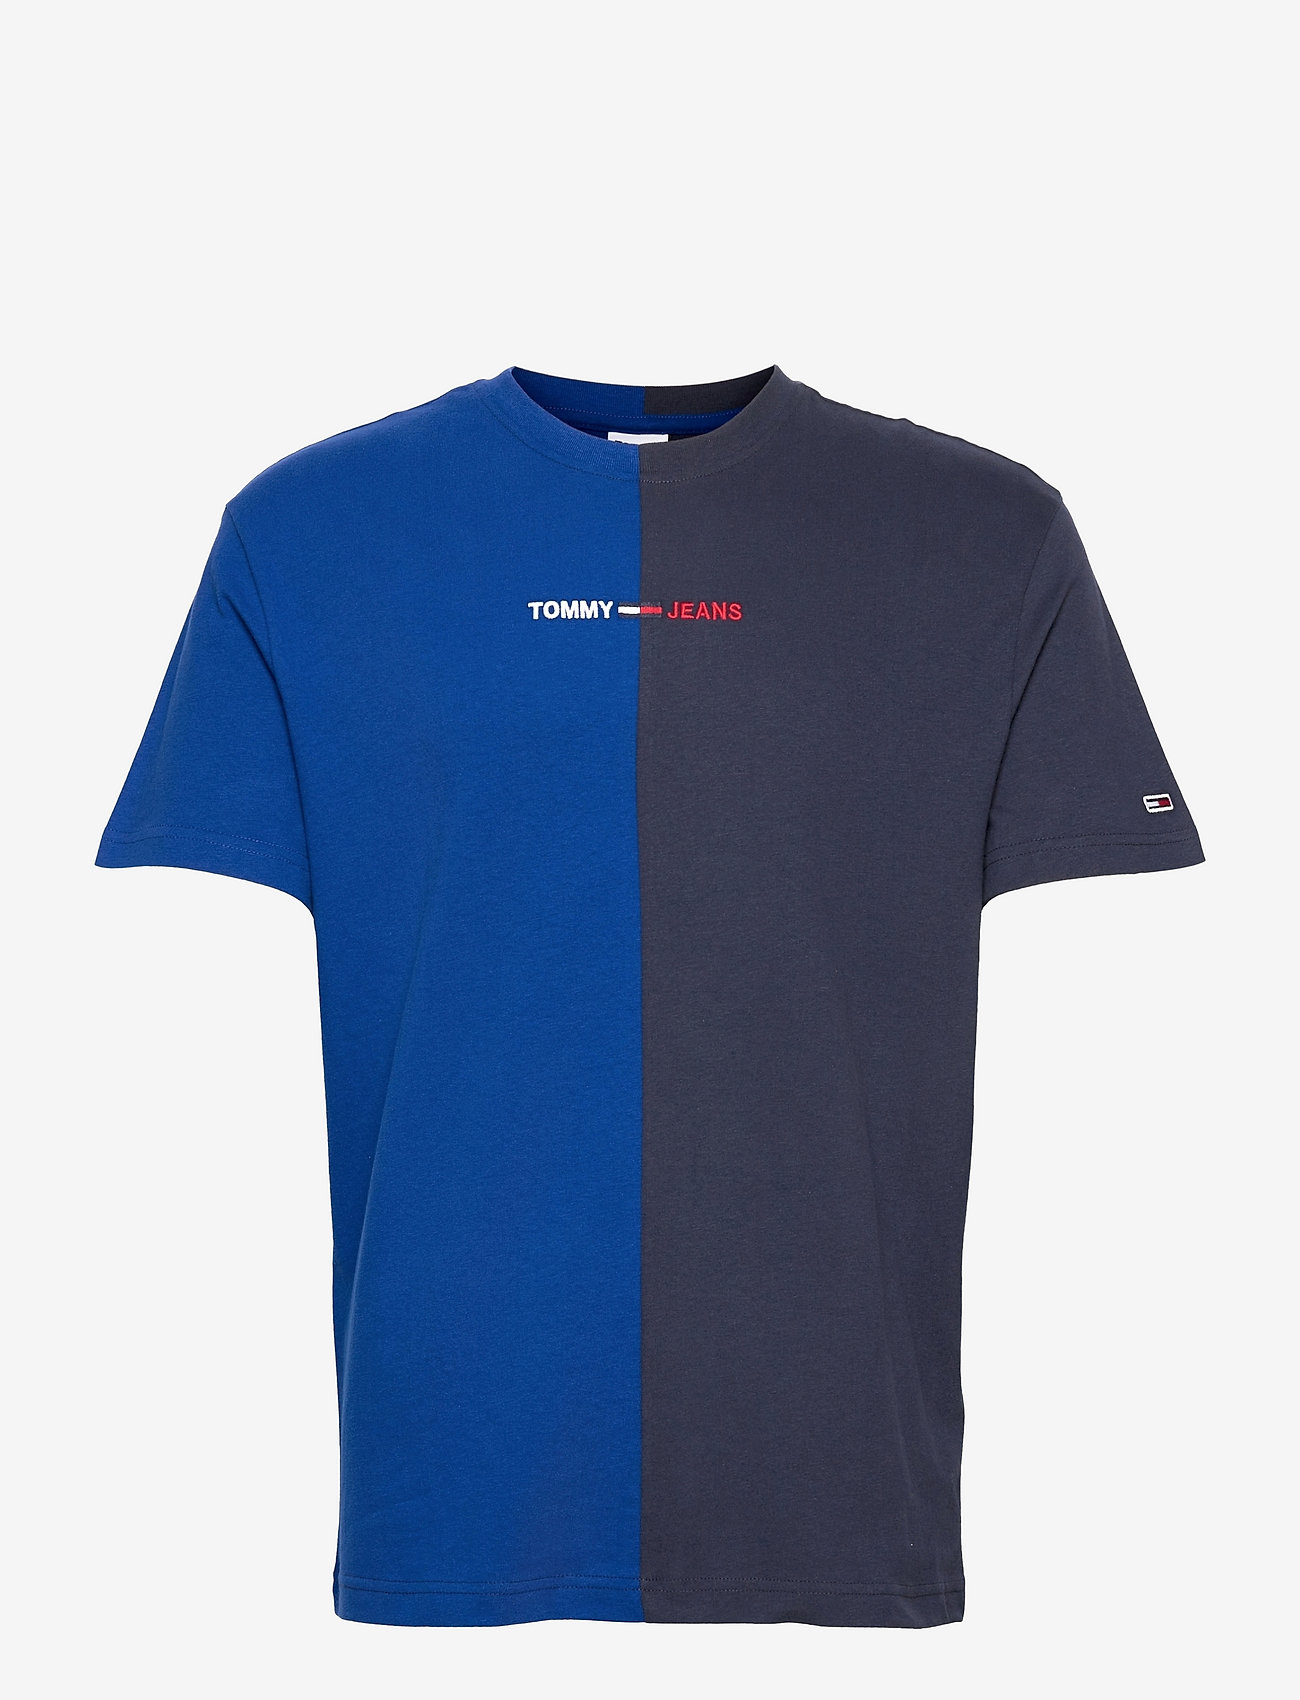 Tommy Jeans - TJM HALF N HALF LINEAR LOGO TEE - basic t-shirts - cobalt / twilight navy - 0